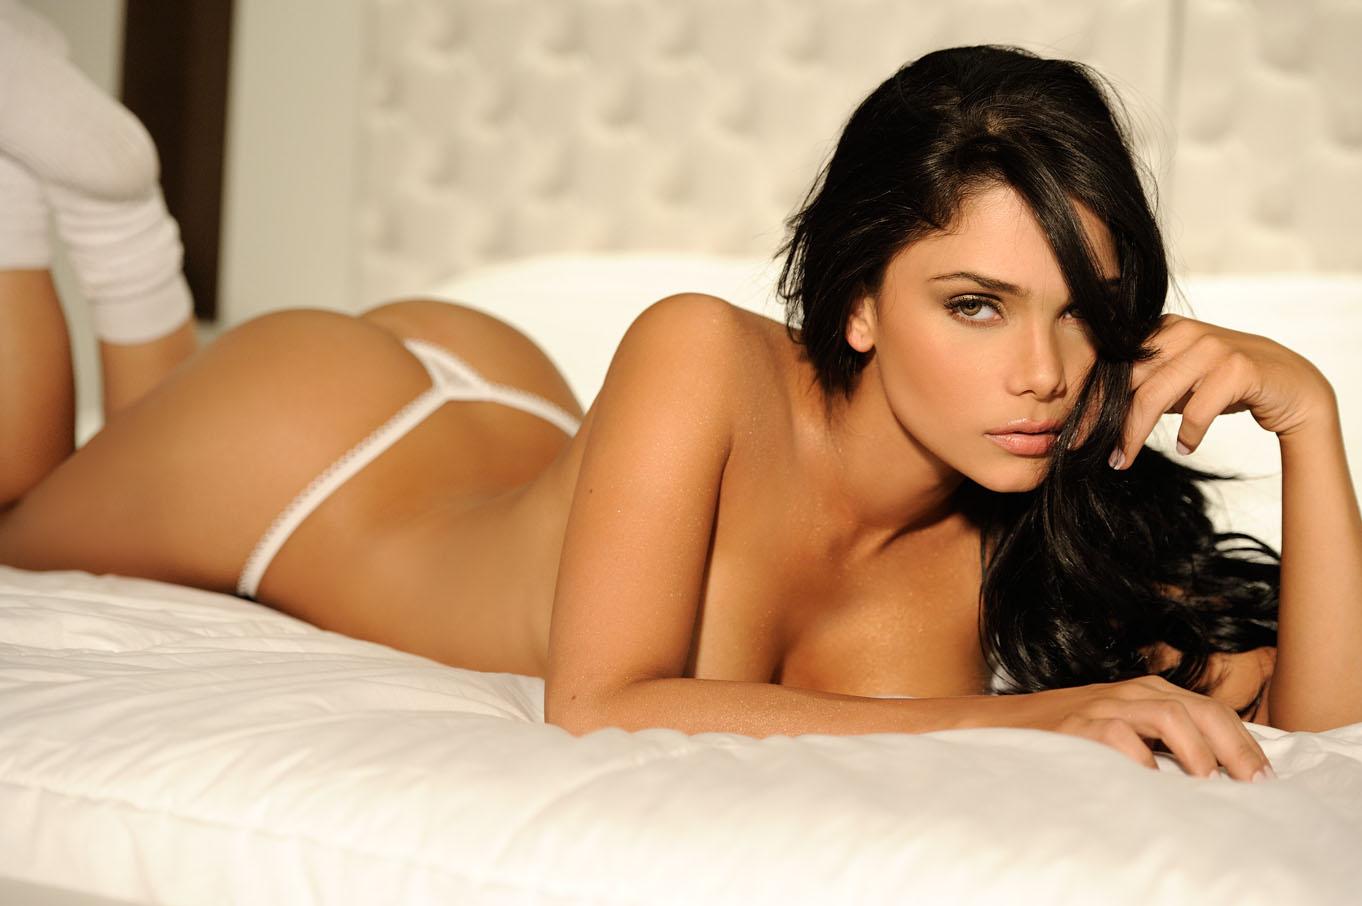 Modelo colombiana ana lucia rey desnuda ver foto gratis images 2